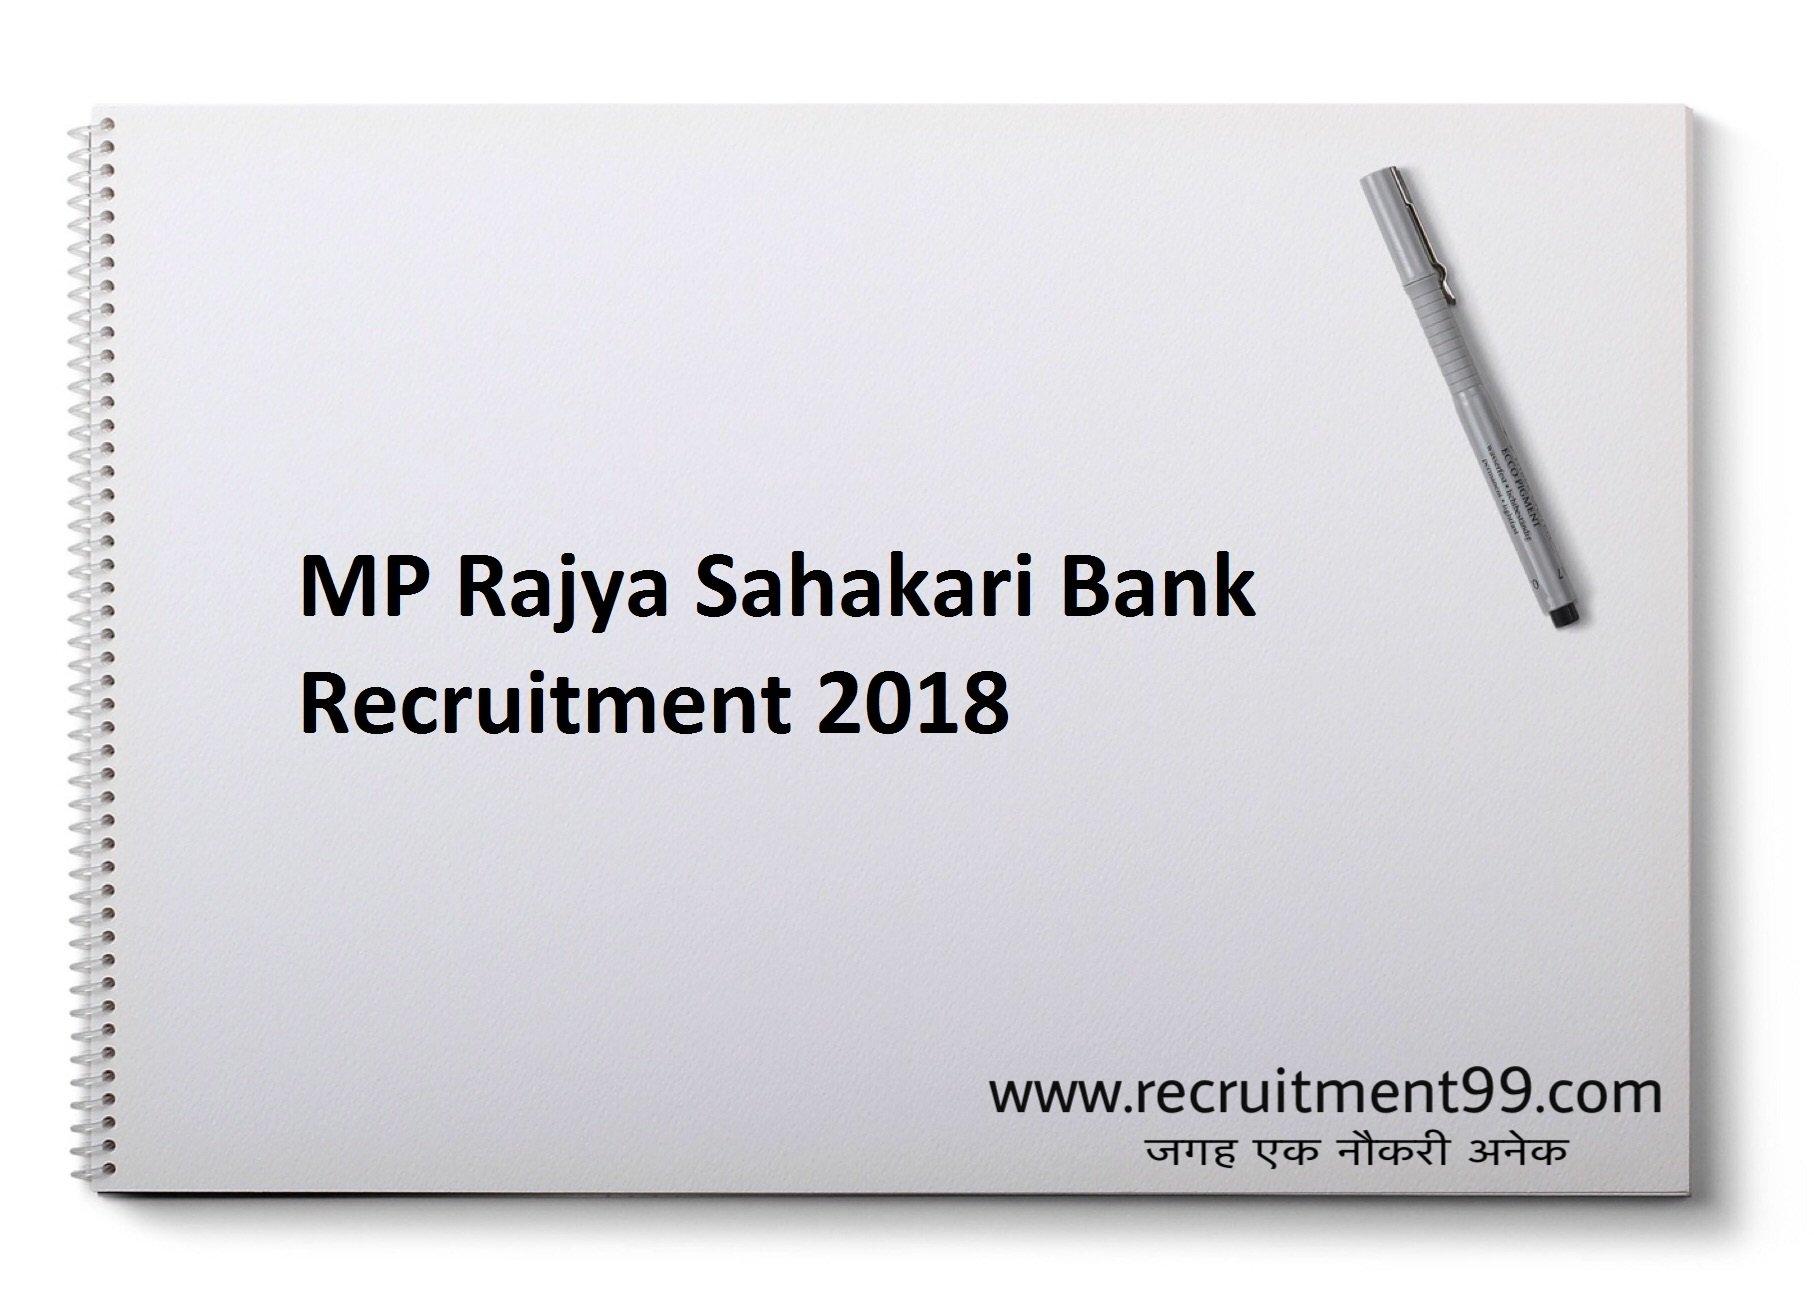 MP Rajya Sahakari Bank Manager Recruitment Admit Card & Result 2018